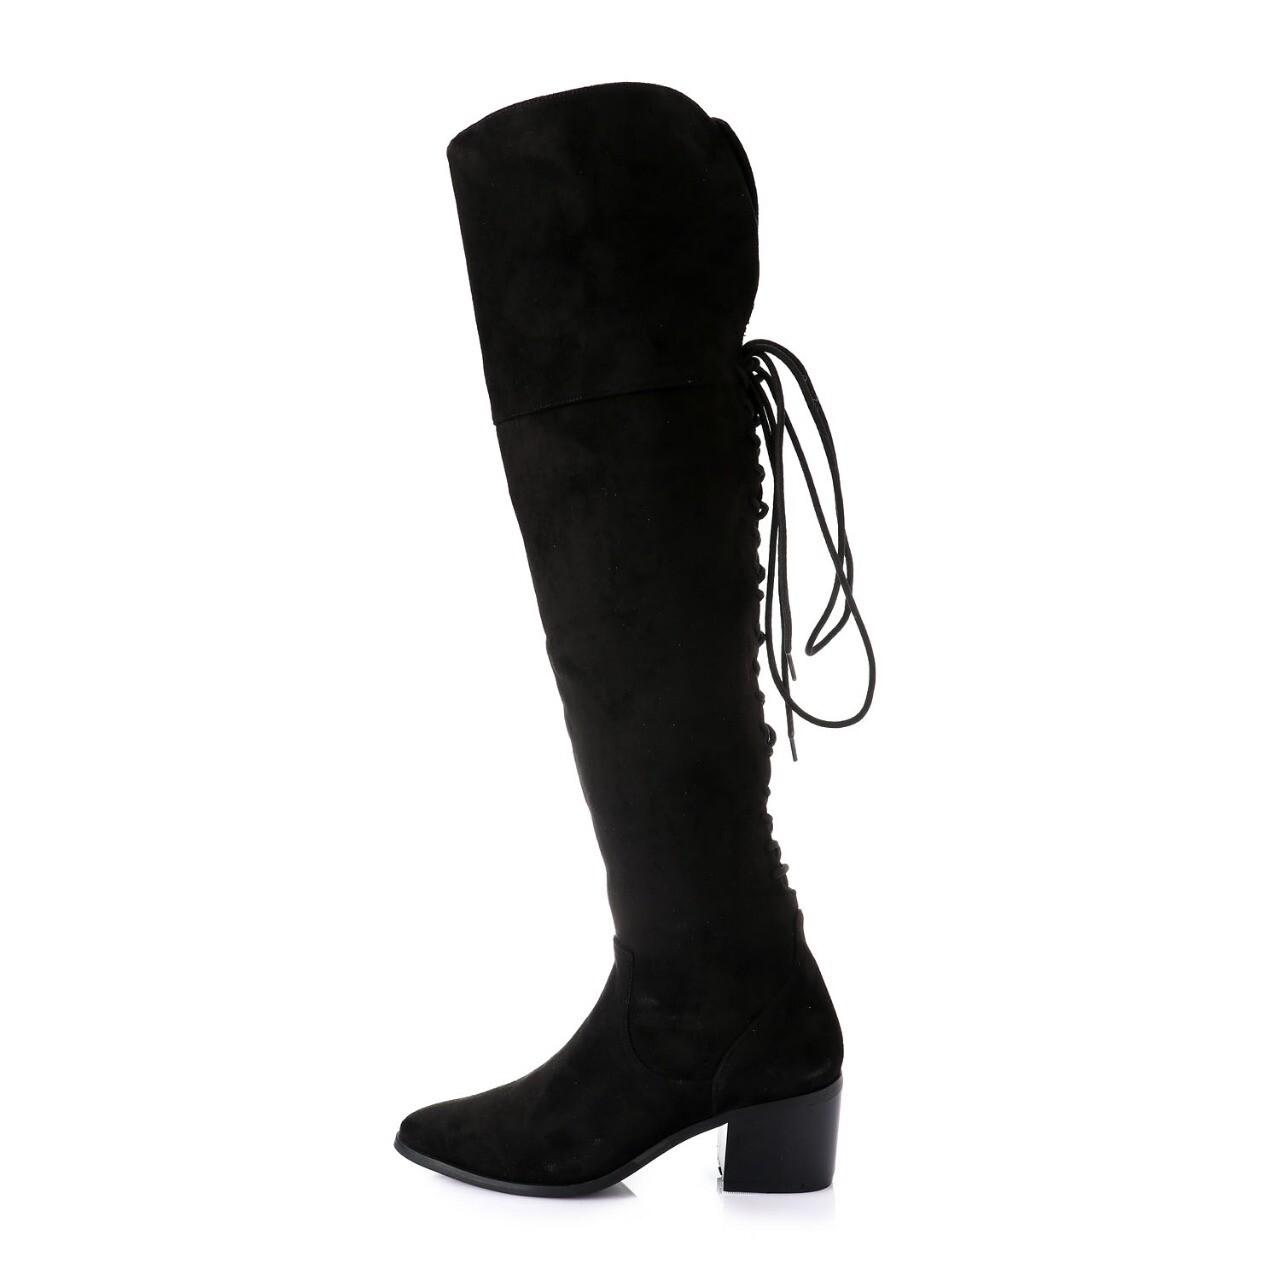 3414 Knee High Boot - Black su